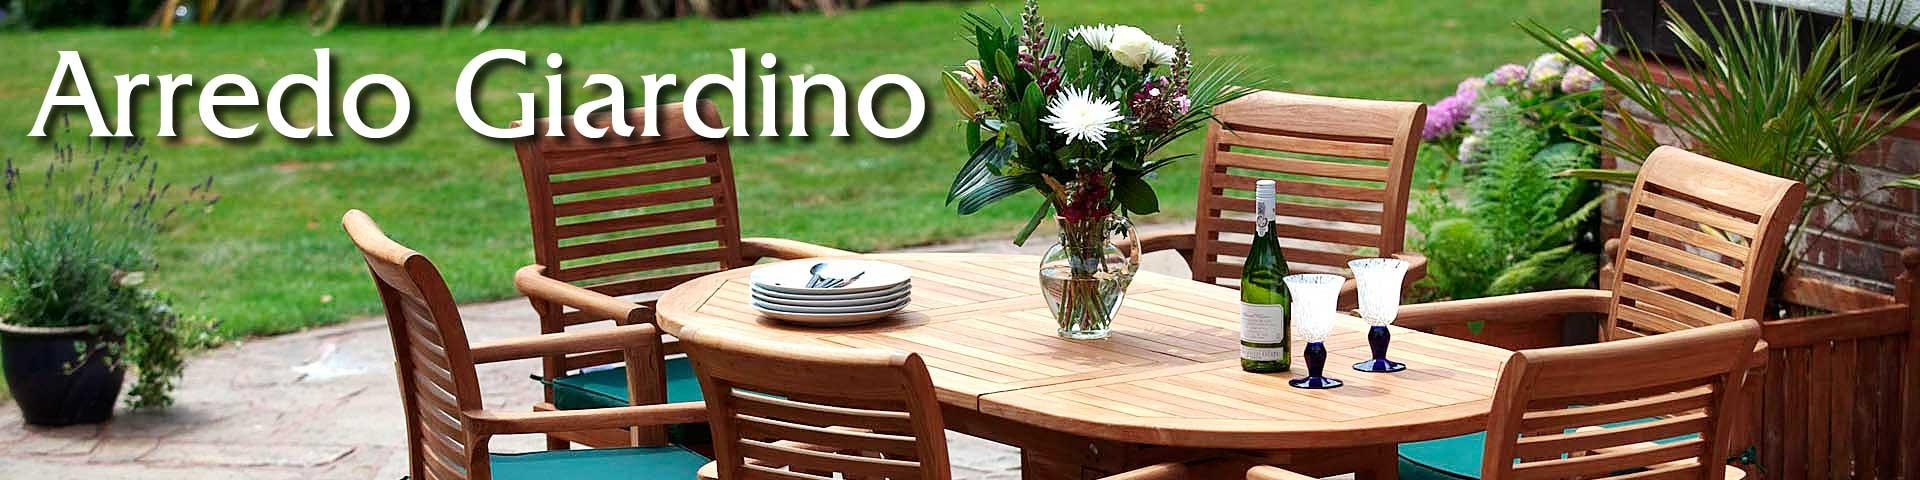 Negozi mobili ancona elegant negozi mobili ancona with for Arredo giardino torino